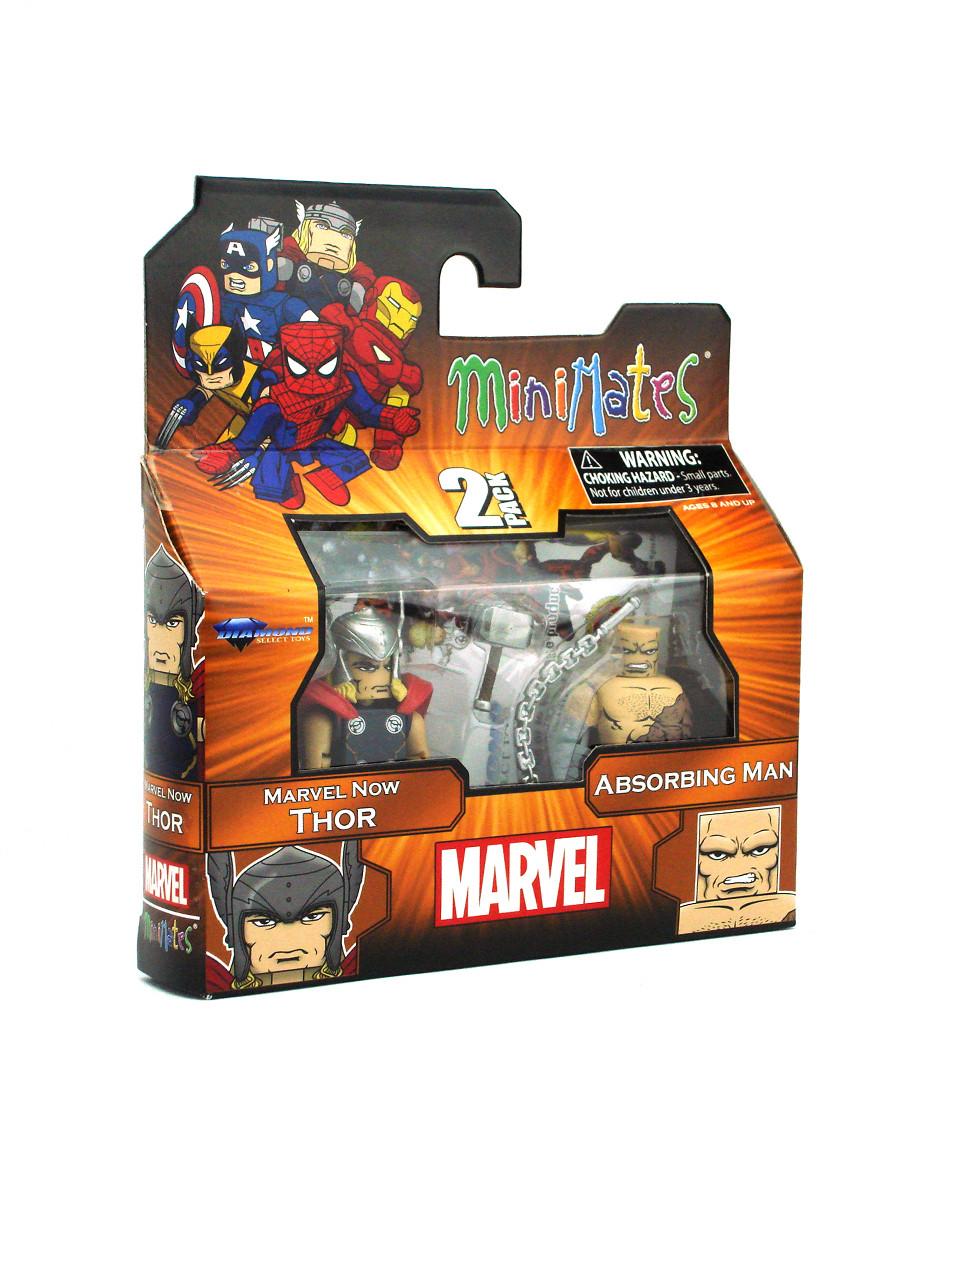 Marvel Minimates Series 5 Absorbing Man